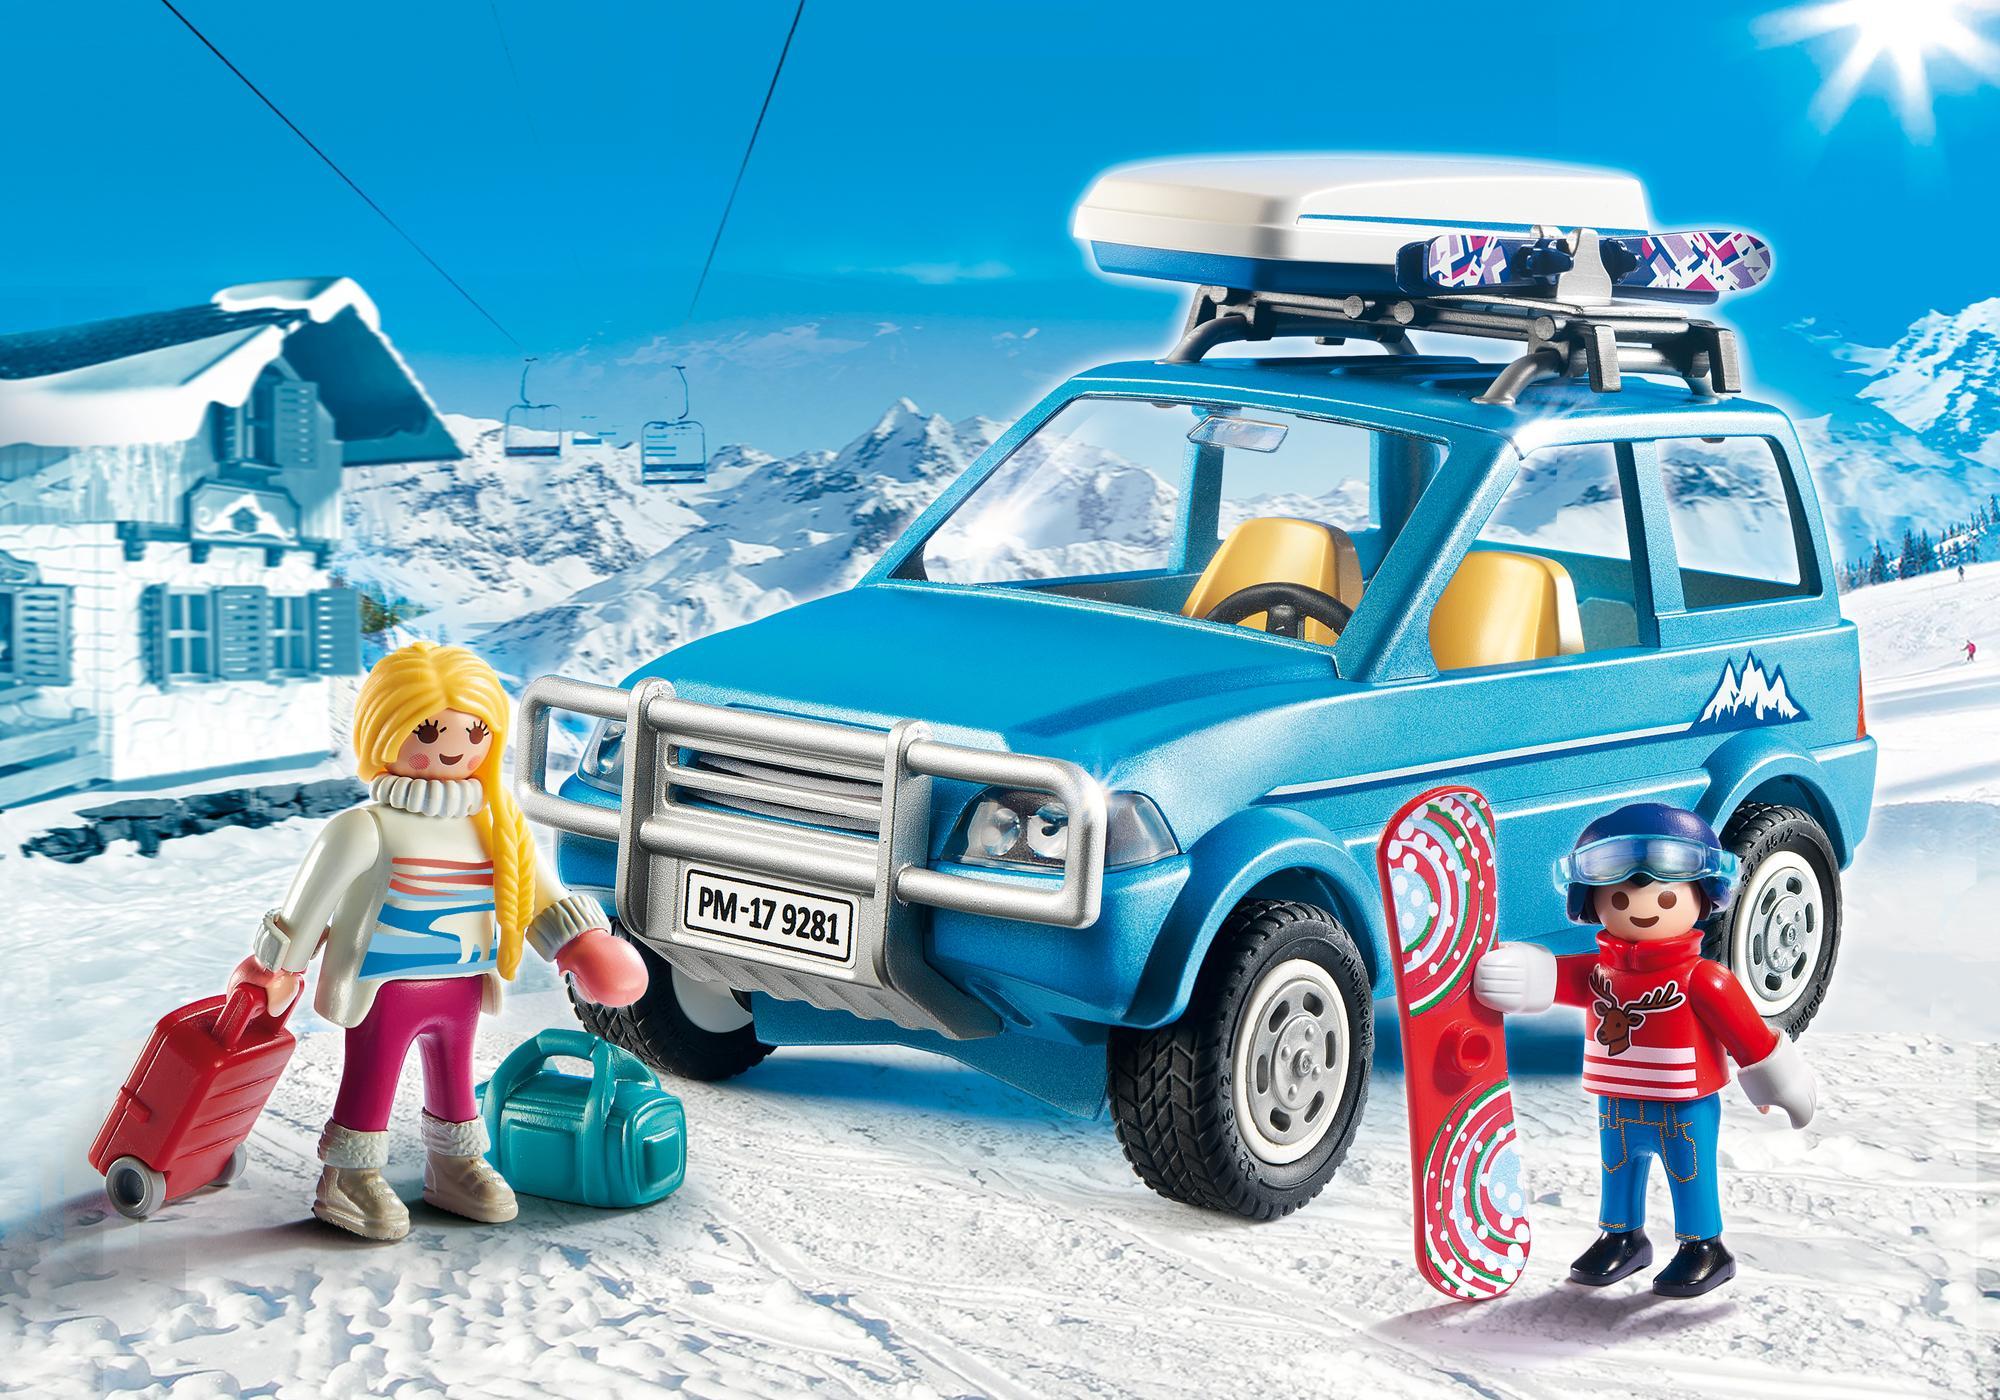 http://media.playmobil.com/i/playmobil/9281_product_detail/Carro de Neve